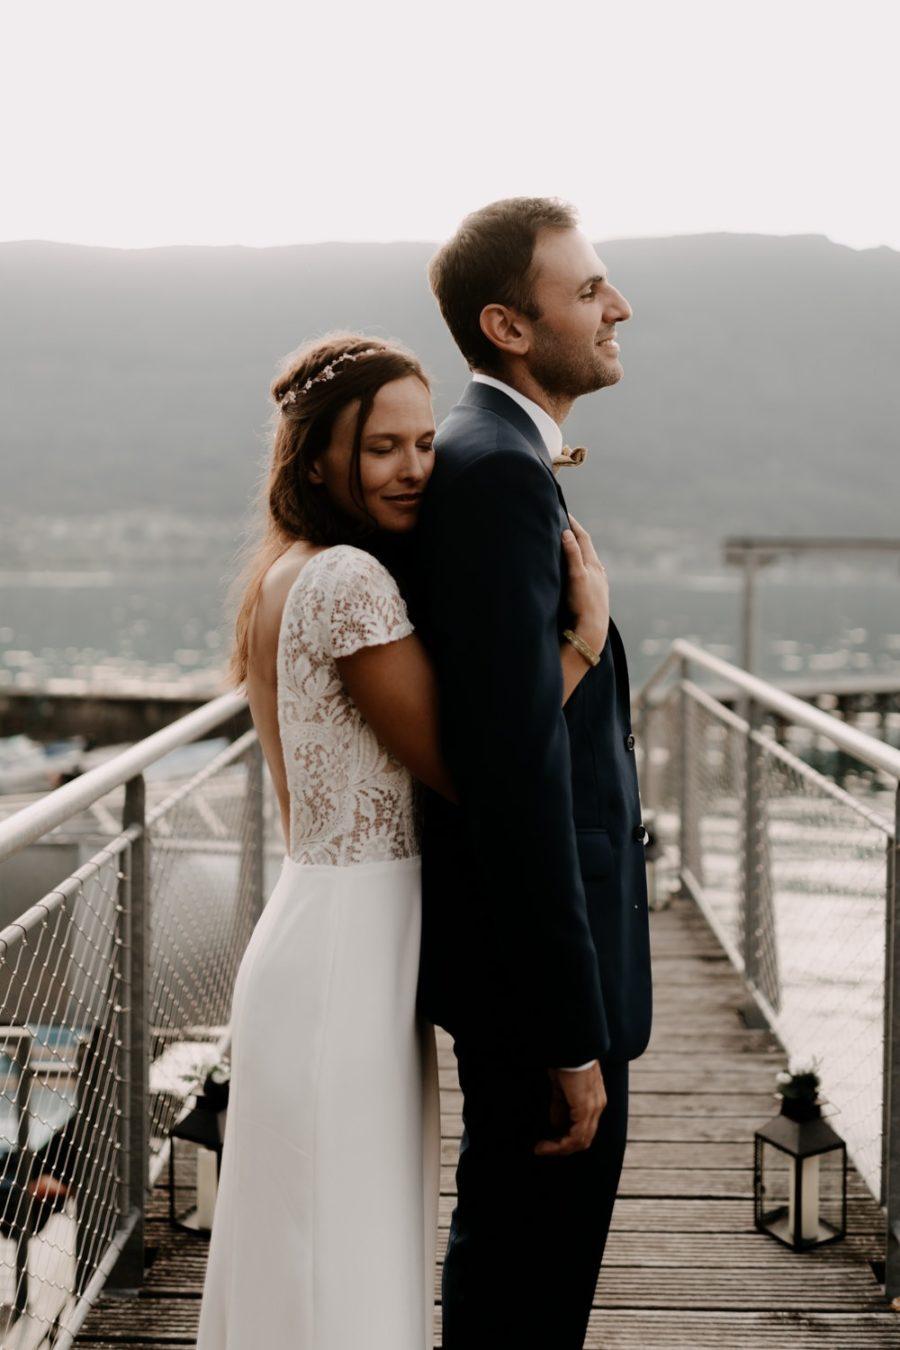 photographe mariage Aix les bain - Photographe mariage chambery - Photographe mariage Annecy - Photo mariage annecy-